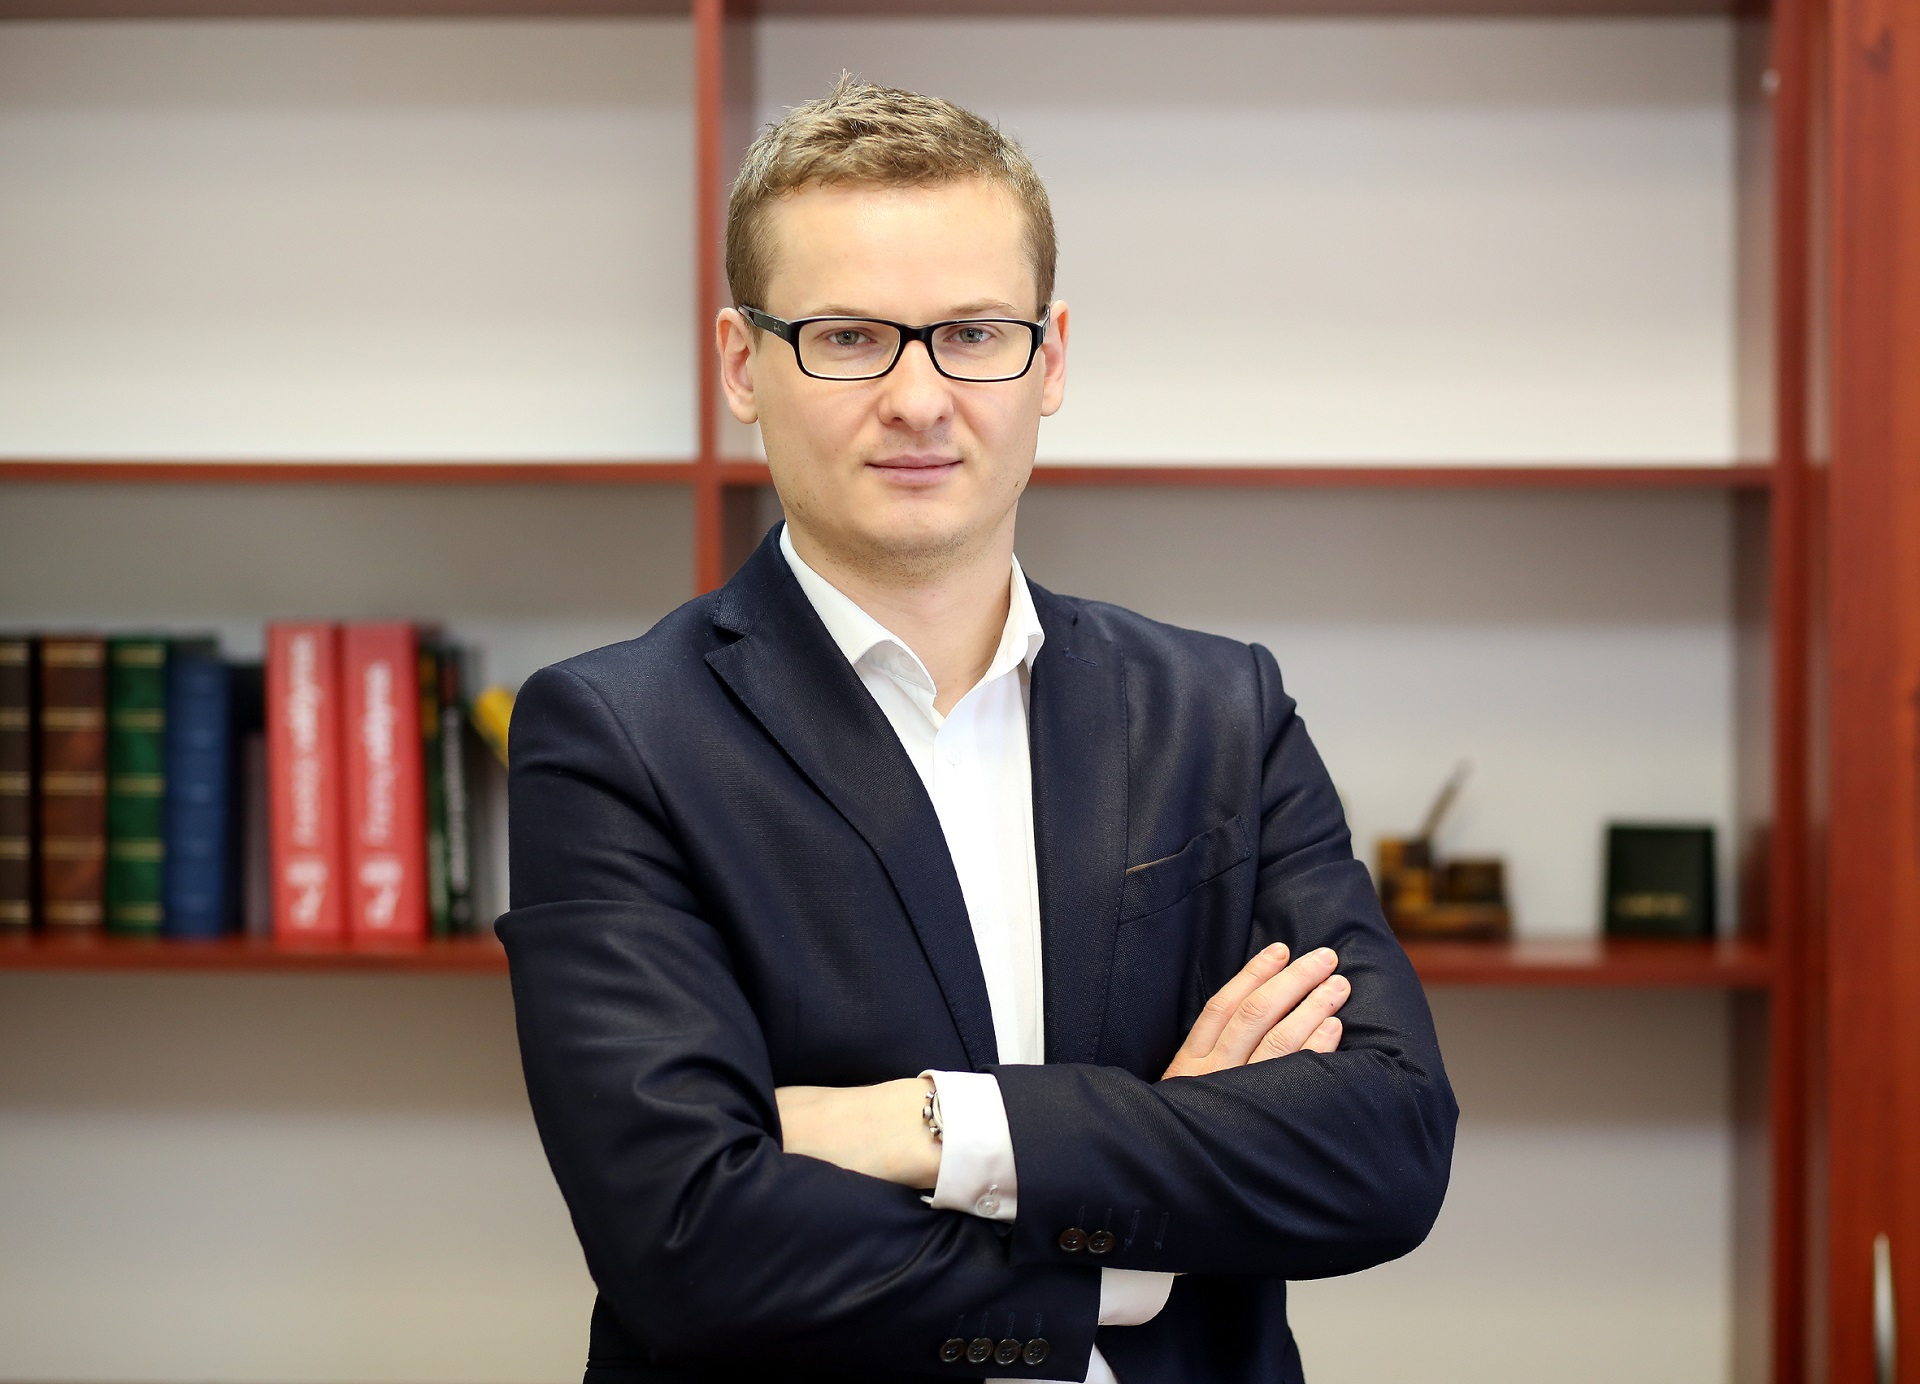 Algirdas Gauronskis, Vikeda gen. direktorius   headline.lt nuotr.